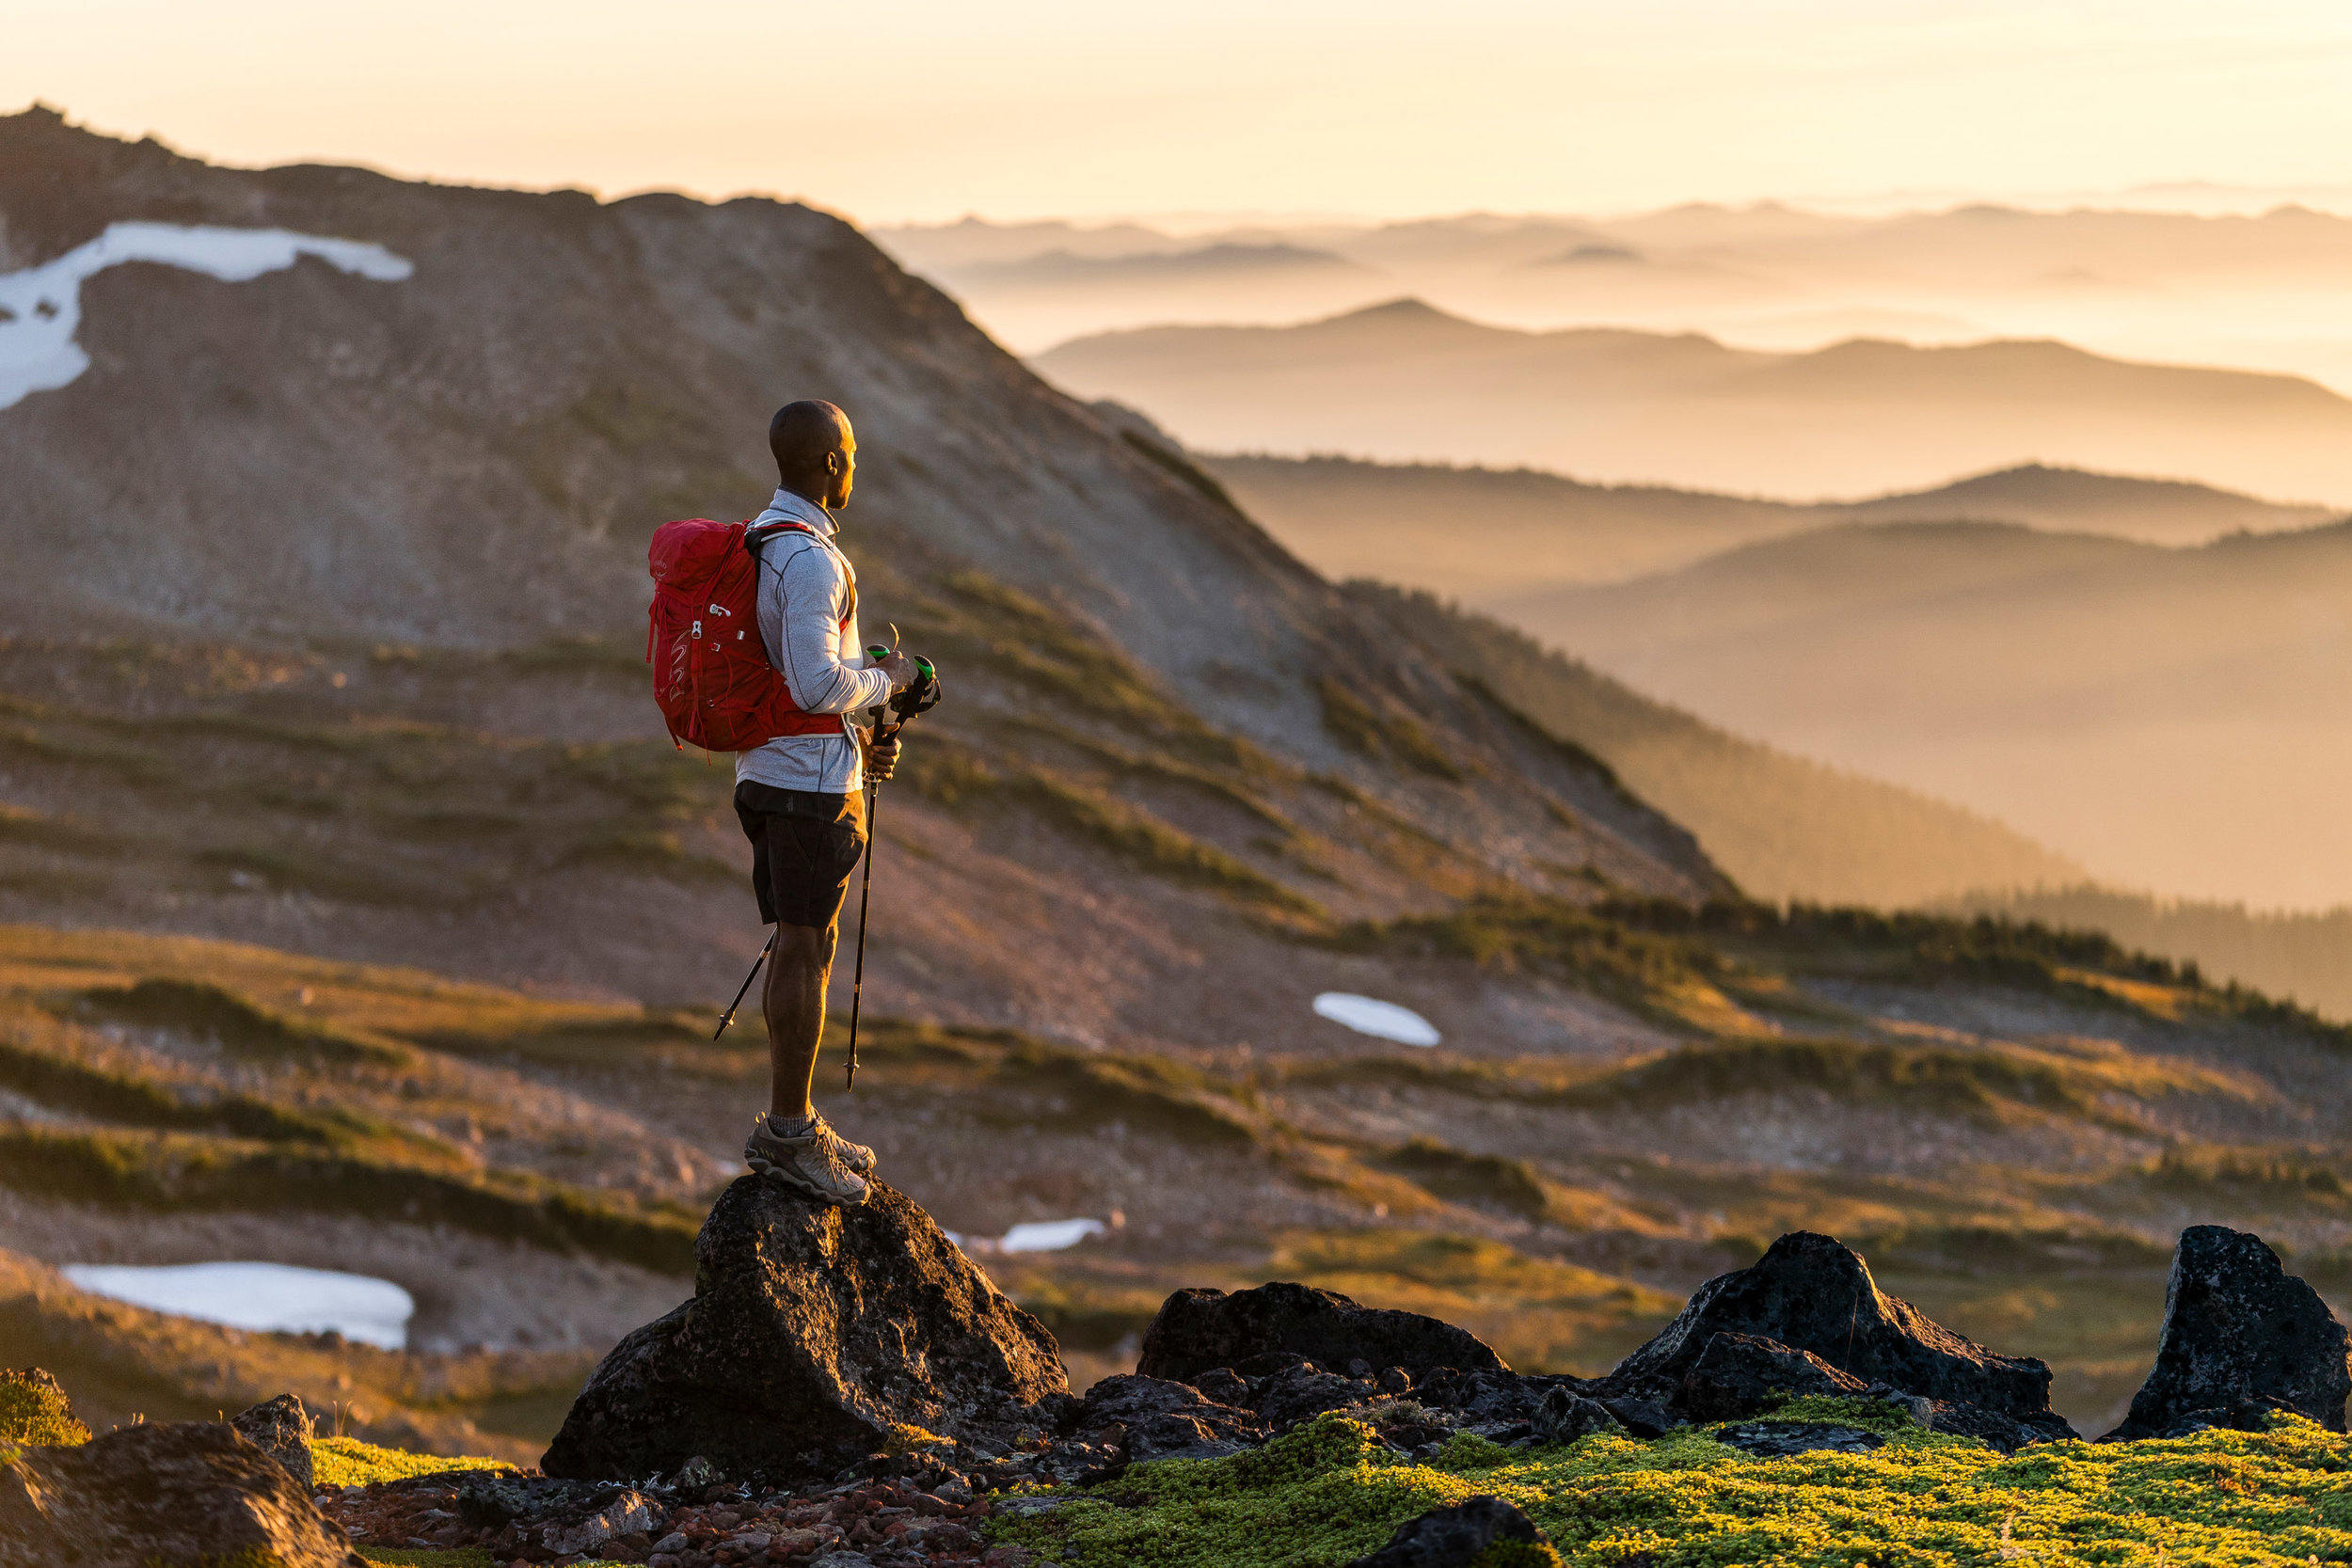 Adventure: Hiking at Mt. Rainier in summertime, Mt. Rainier National Park, Washington